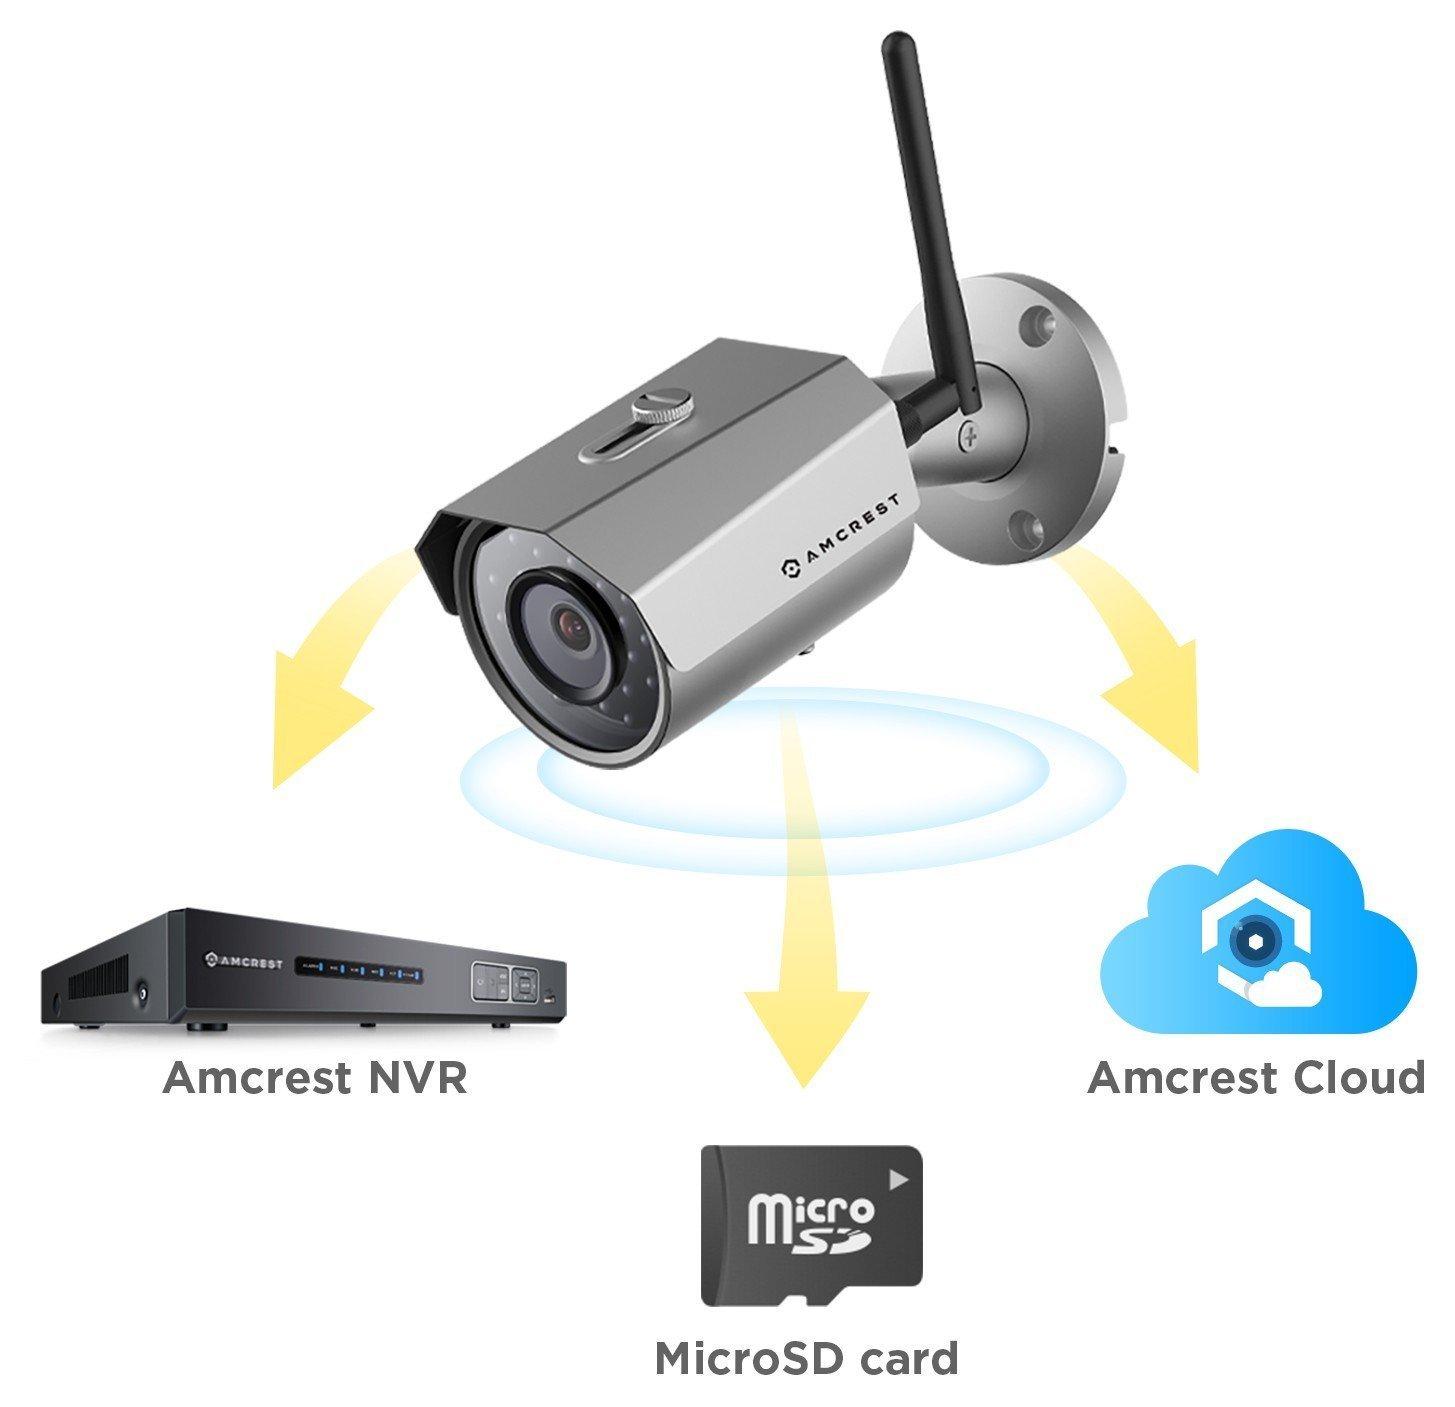 IP67 Weatherproof IP3M-943B 1080P//1296P 2304 x 1296P Black Amcrest ProHD Outdoor 3-Megapixel Renewed 3MP WiFi Wireless IP Security Bullet Camera